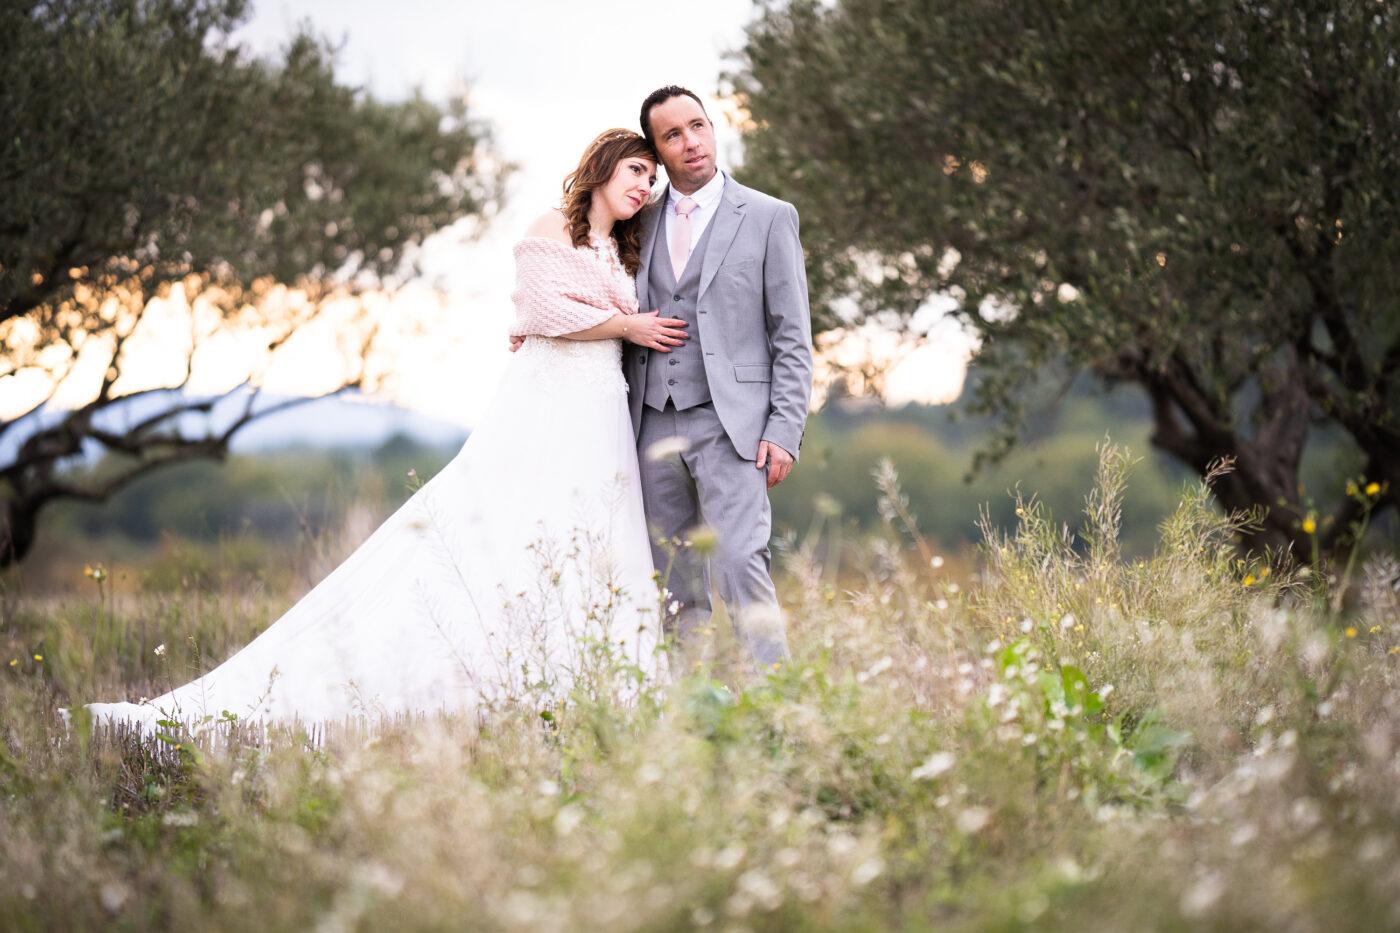 photos de couples lors d'un mariage